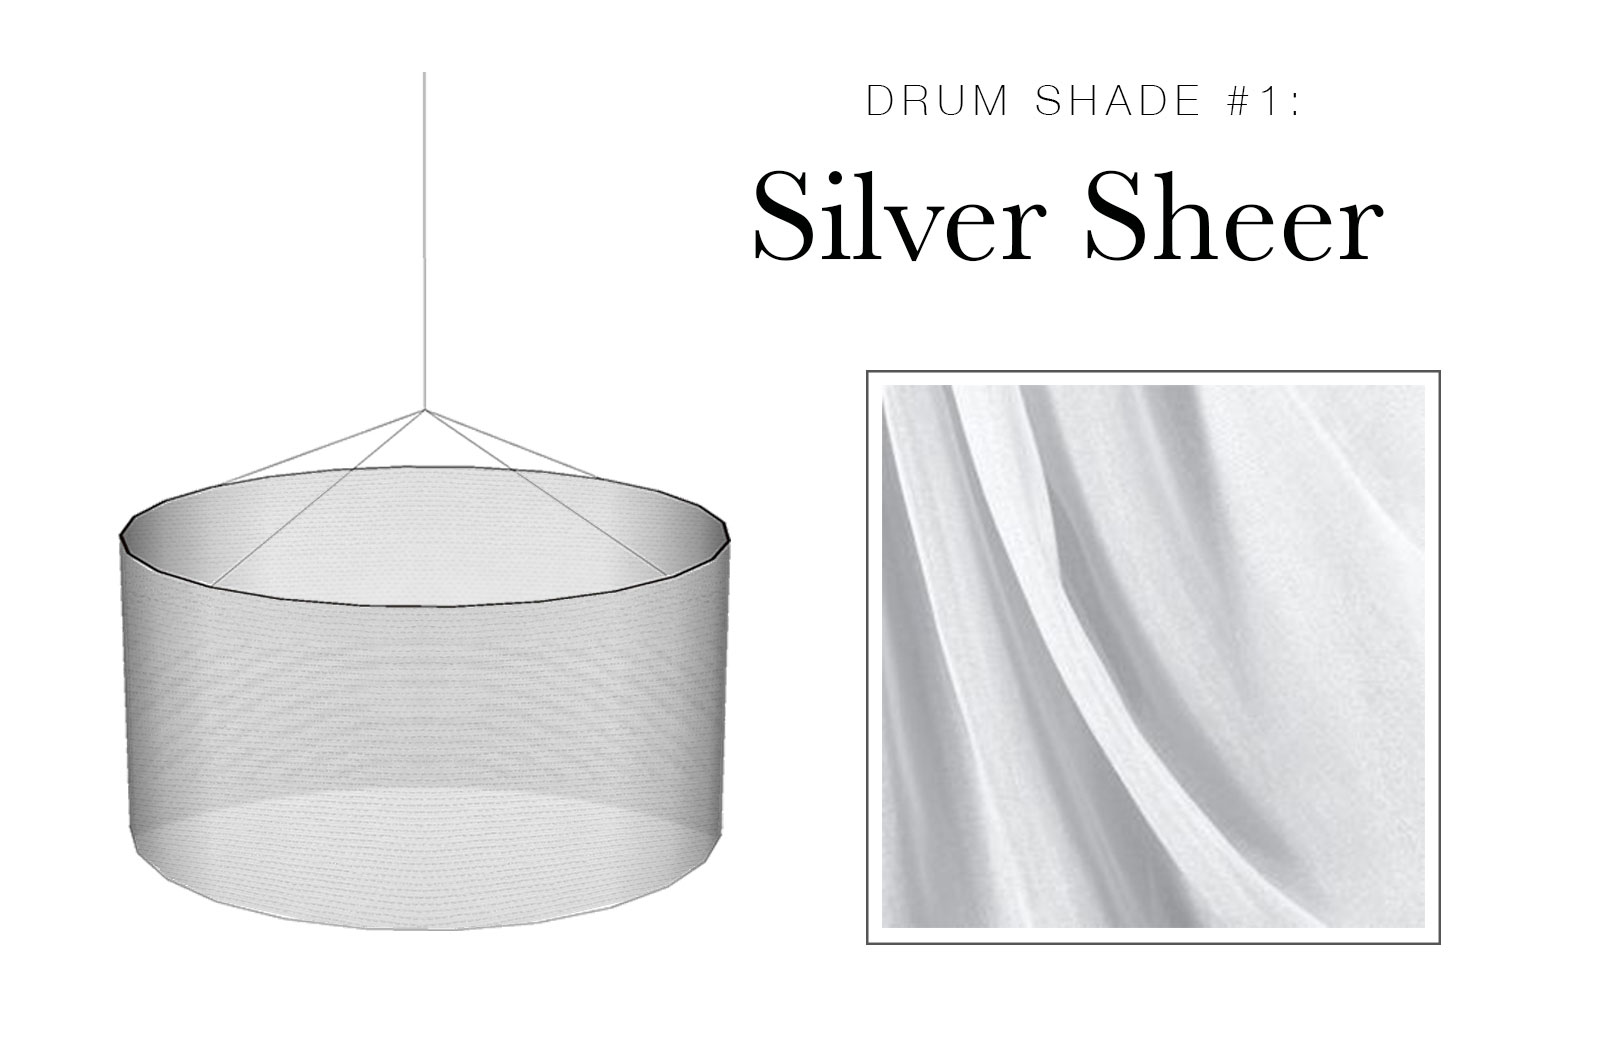 Drum Shade #1: Silver Sheer